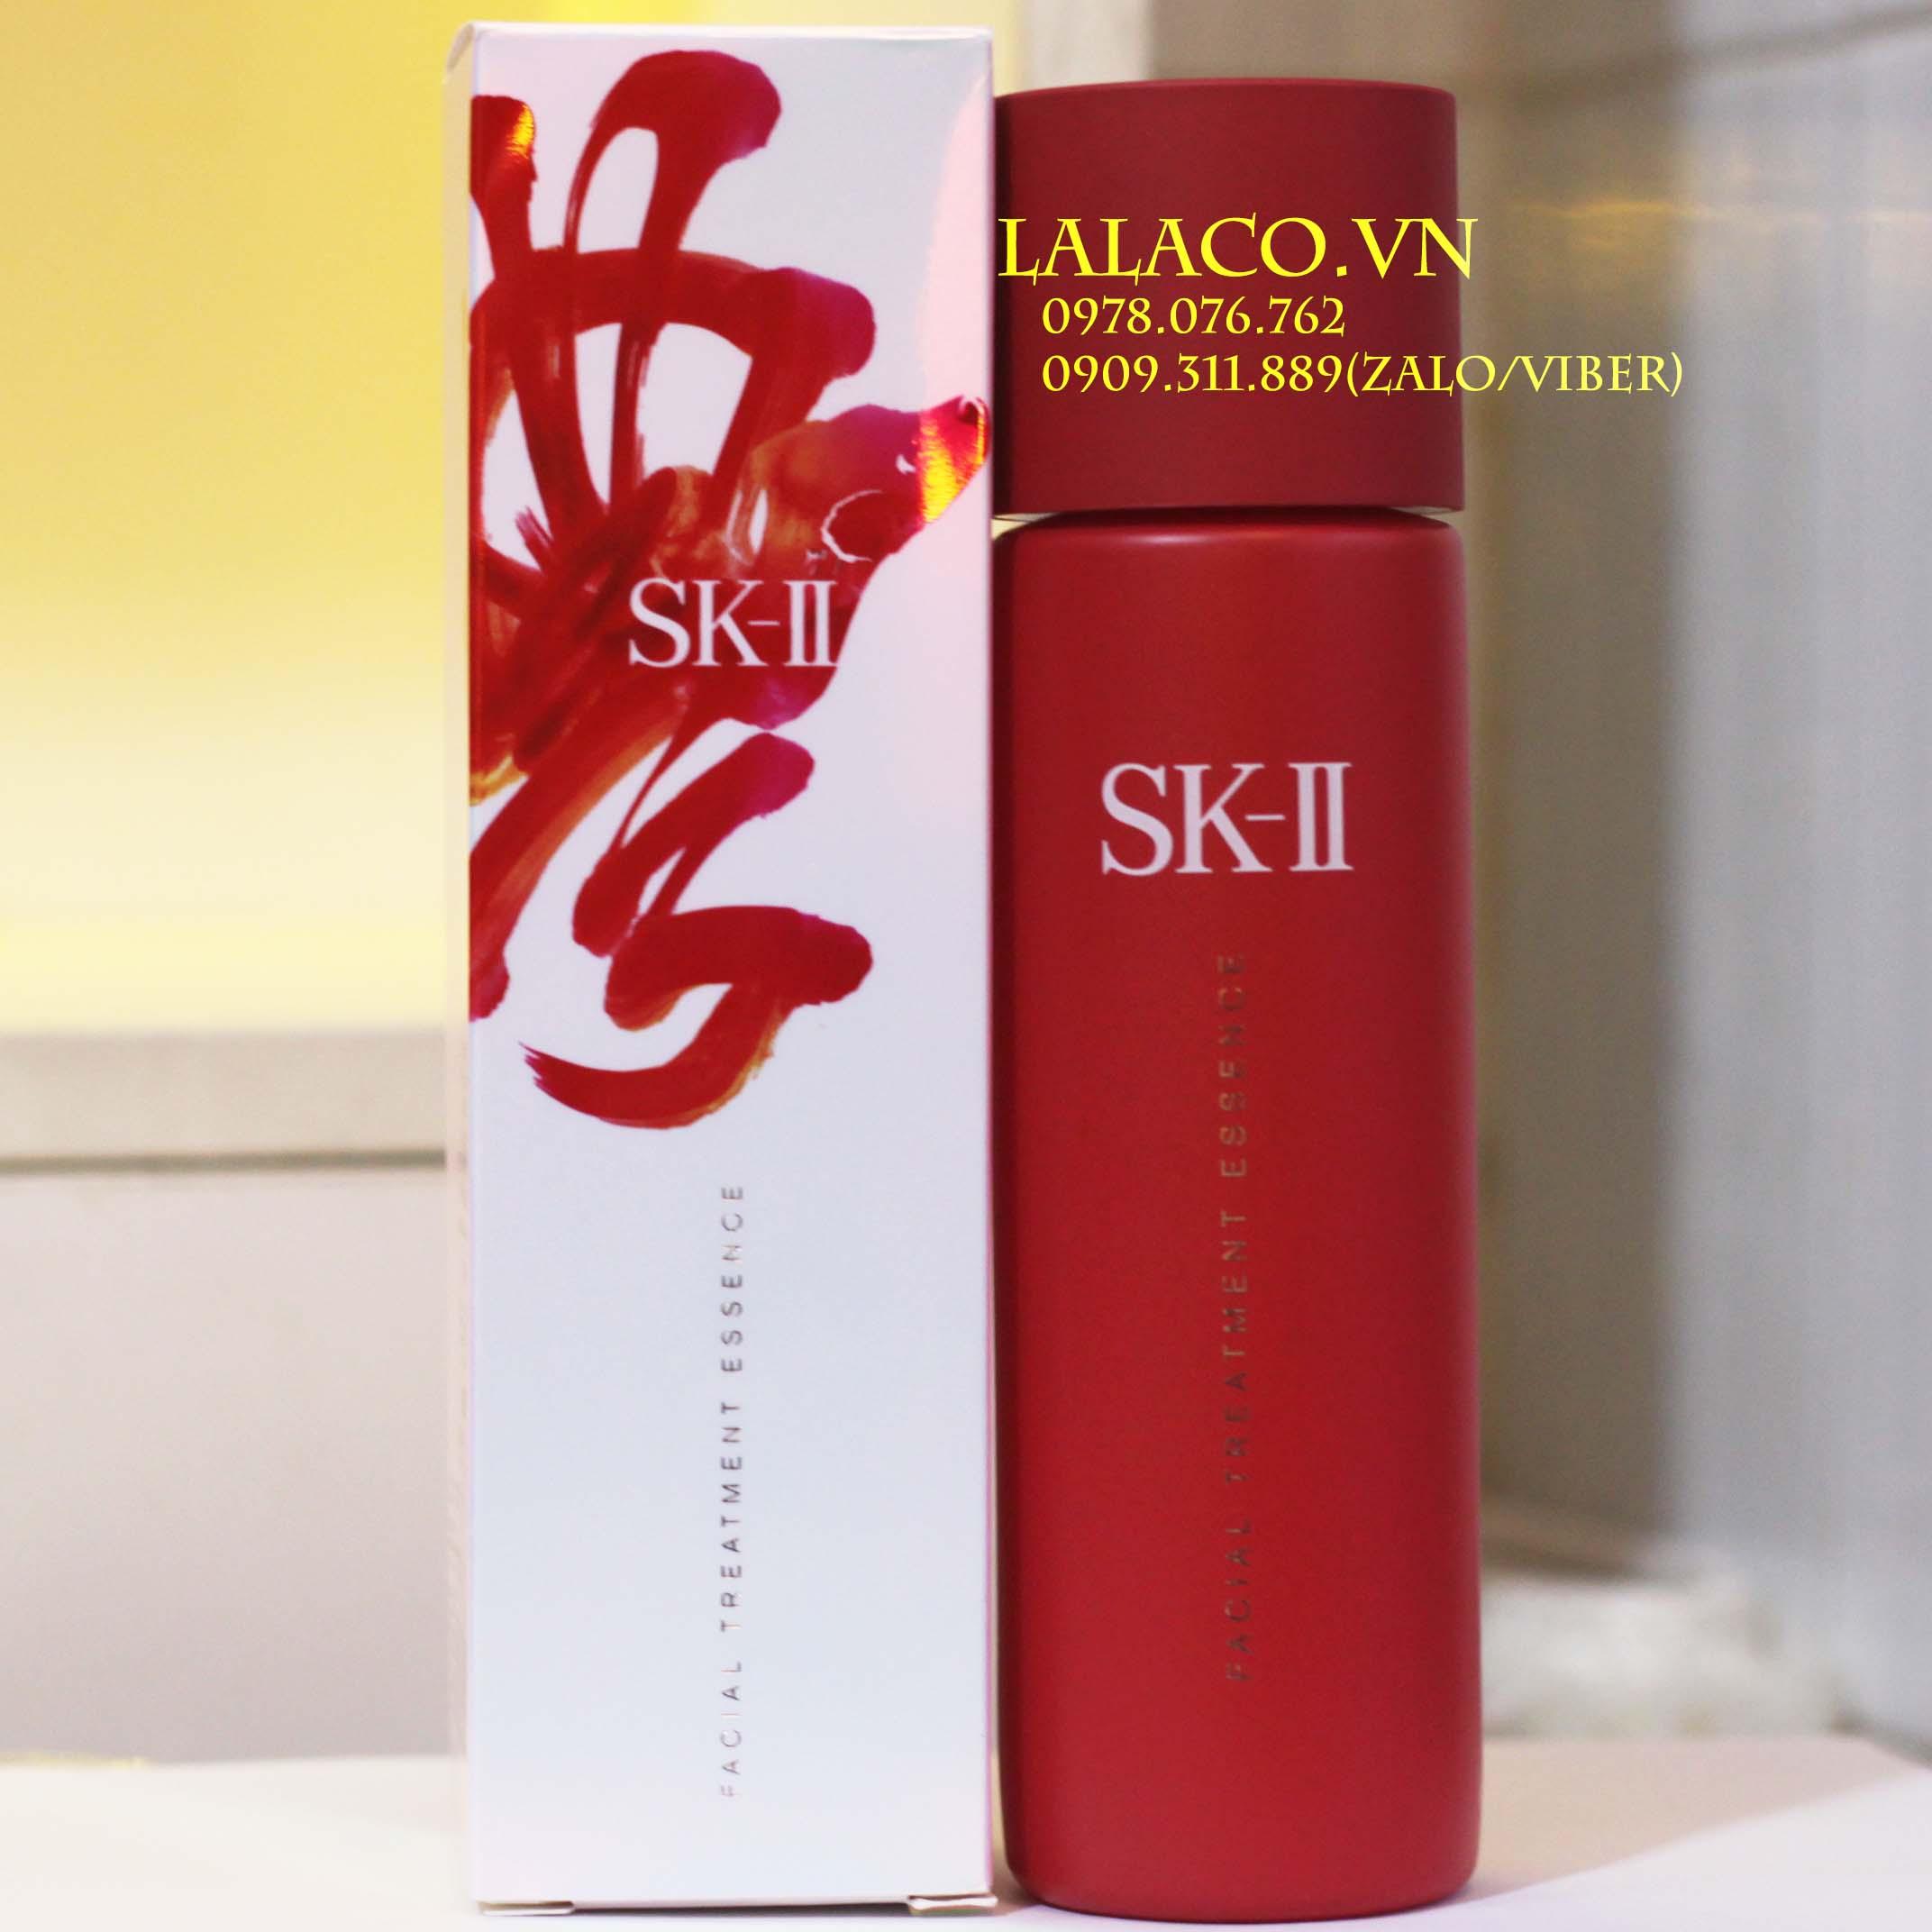 Mỹ phẩm SK-II